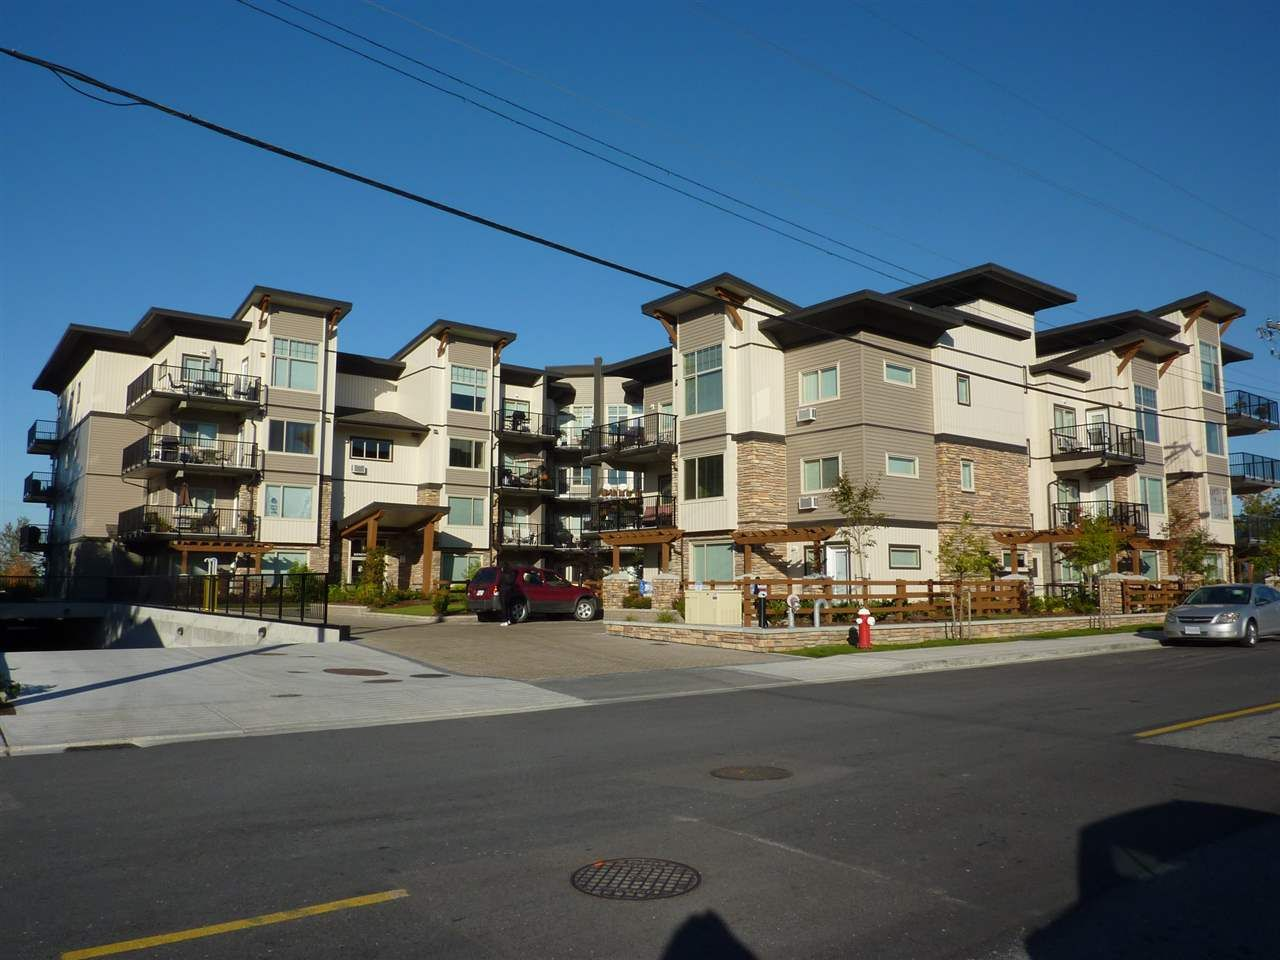 "Main Photo: 110 11935 BURNETT Street in Maple Ridge: East Central Condo for sale in ""KENSINGTON PARK"" : MLS®# R2052343"